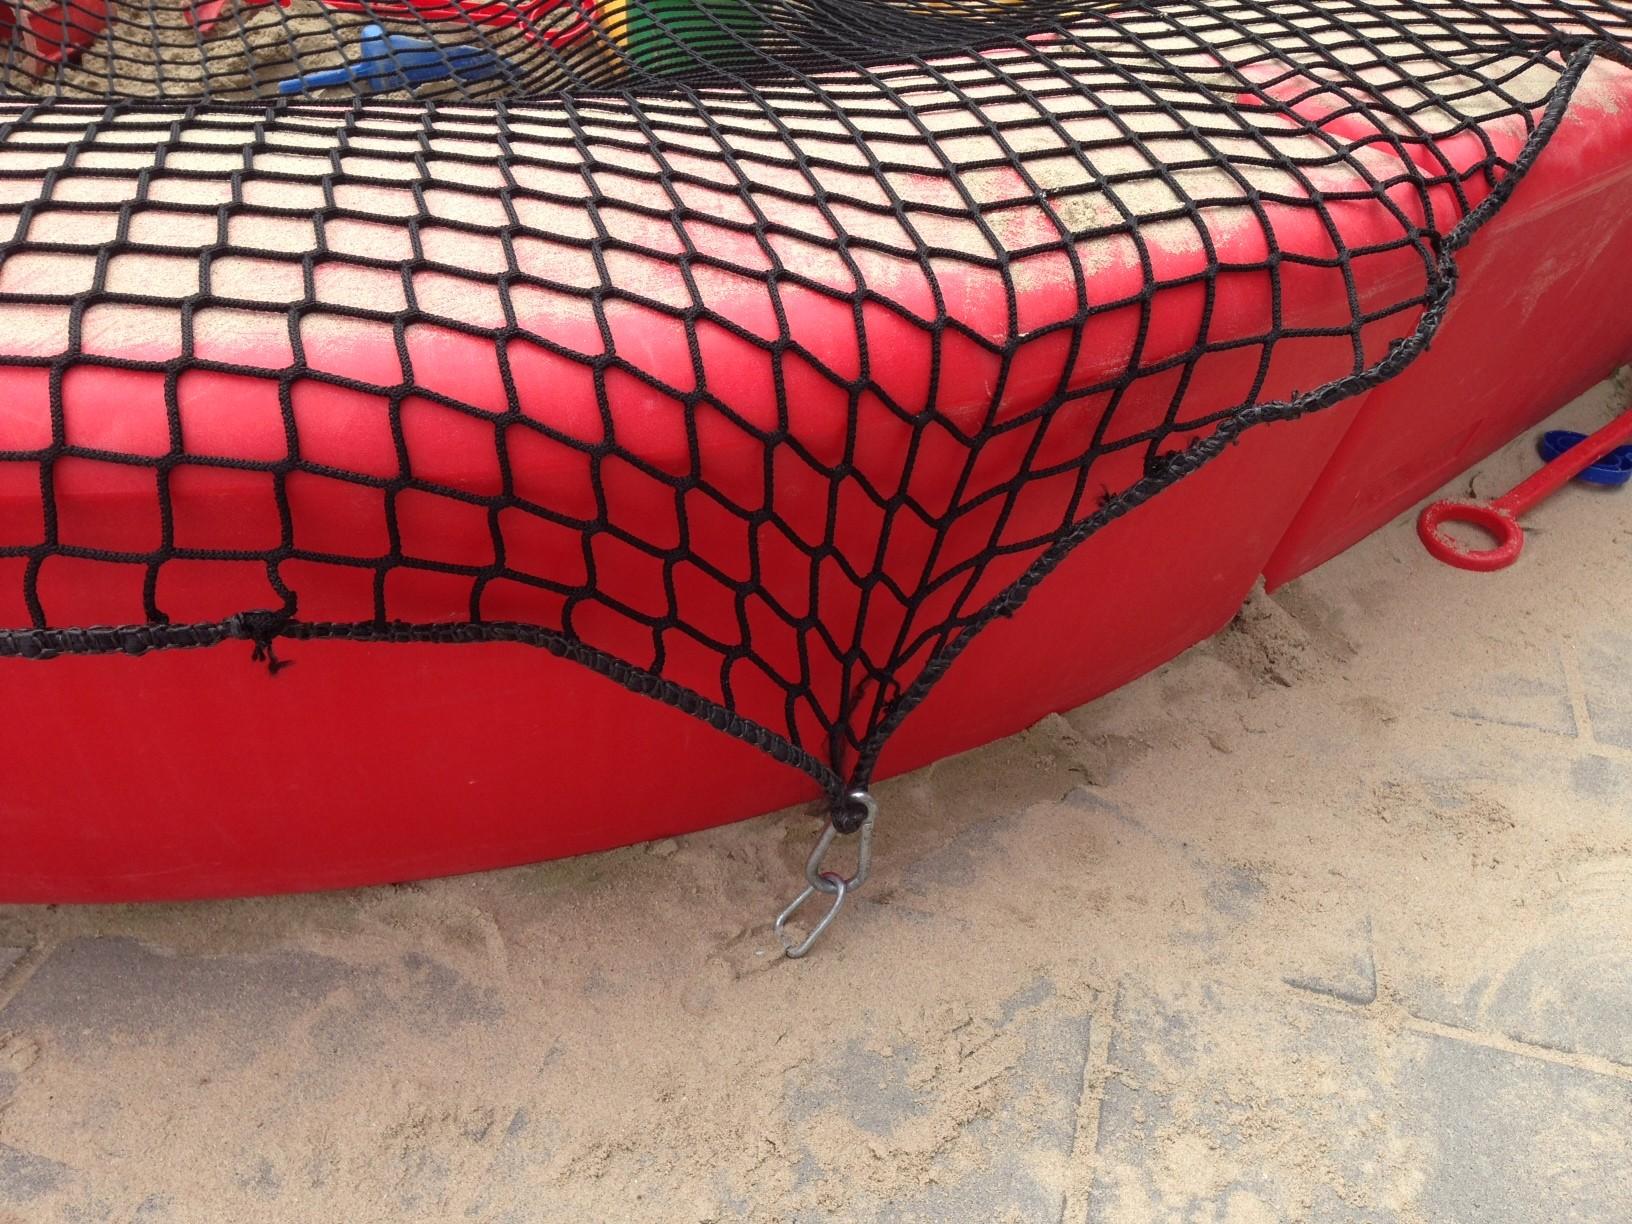 Loop zandbak gemaakt van polyethyleen